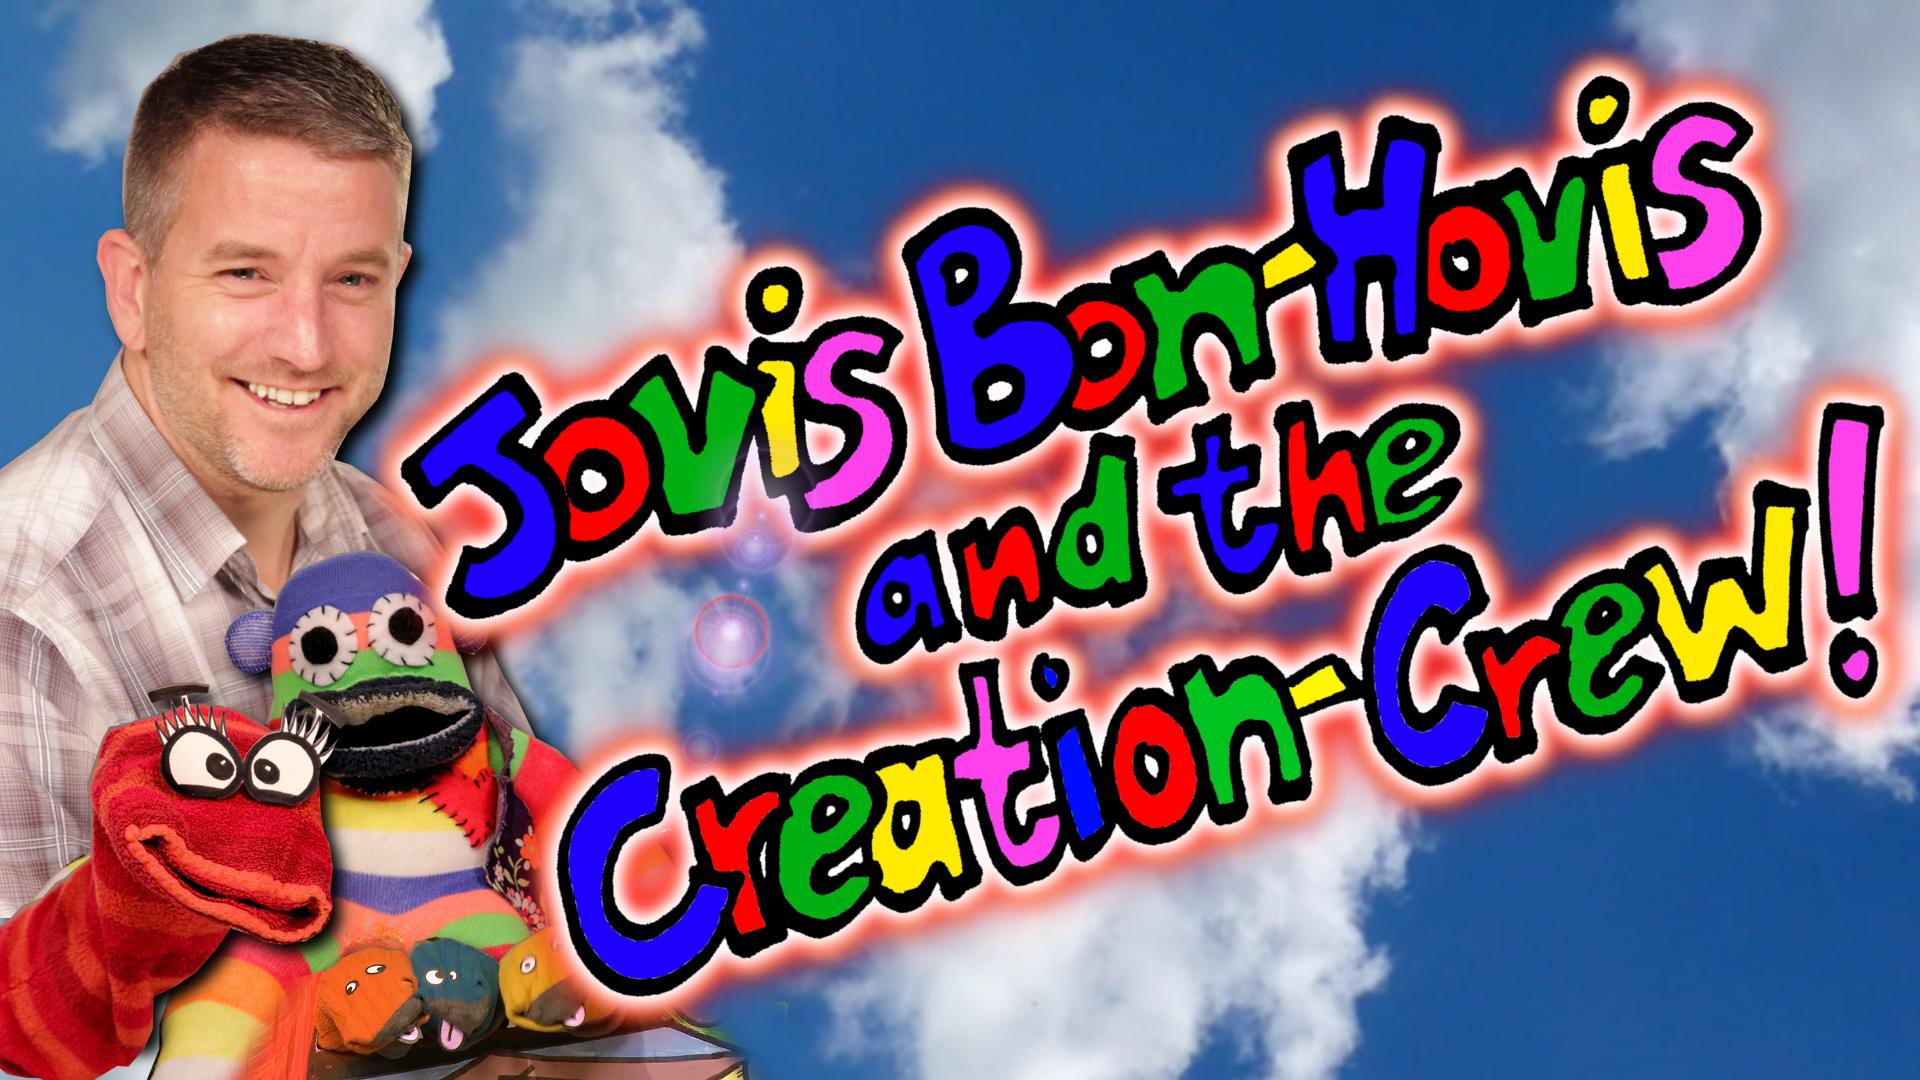 Jovis bon hovis and the creation crew